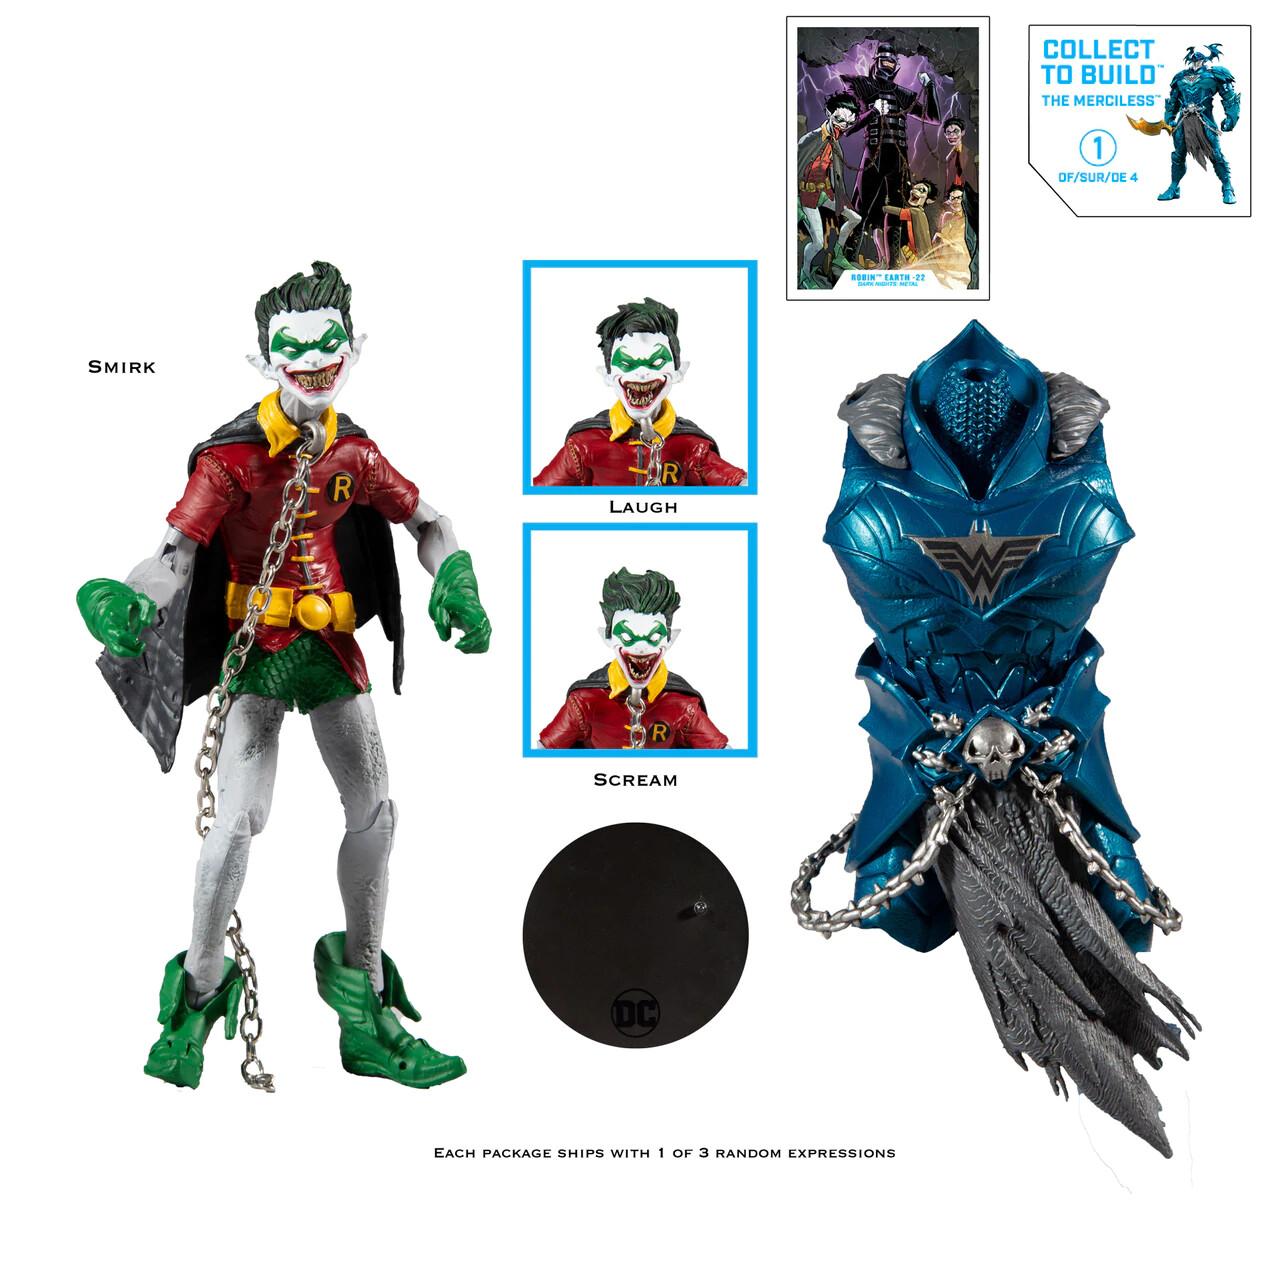 "Mcfarlane DC MULTIVERSE 7"" ACTION FIGURE - Wave 2 Robin Crow"